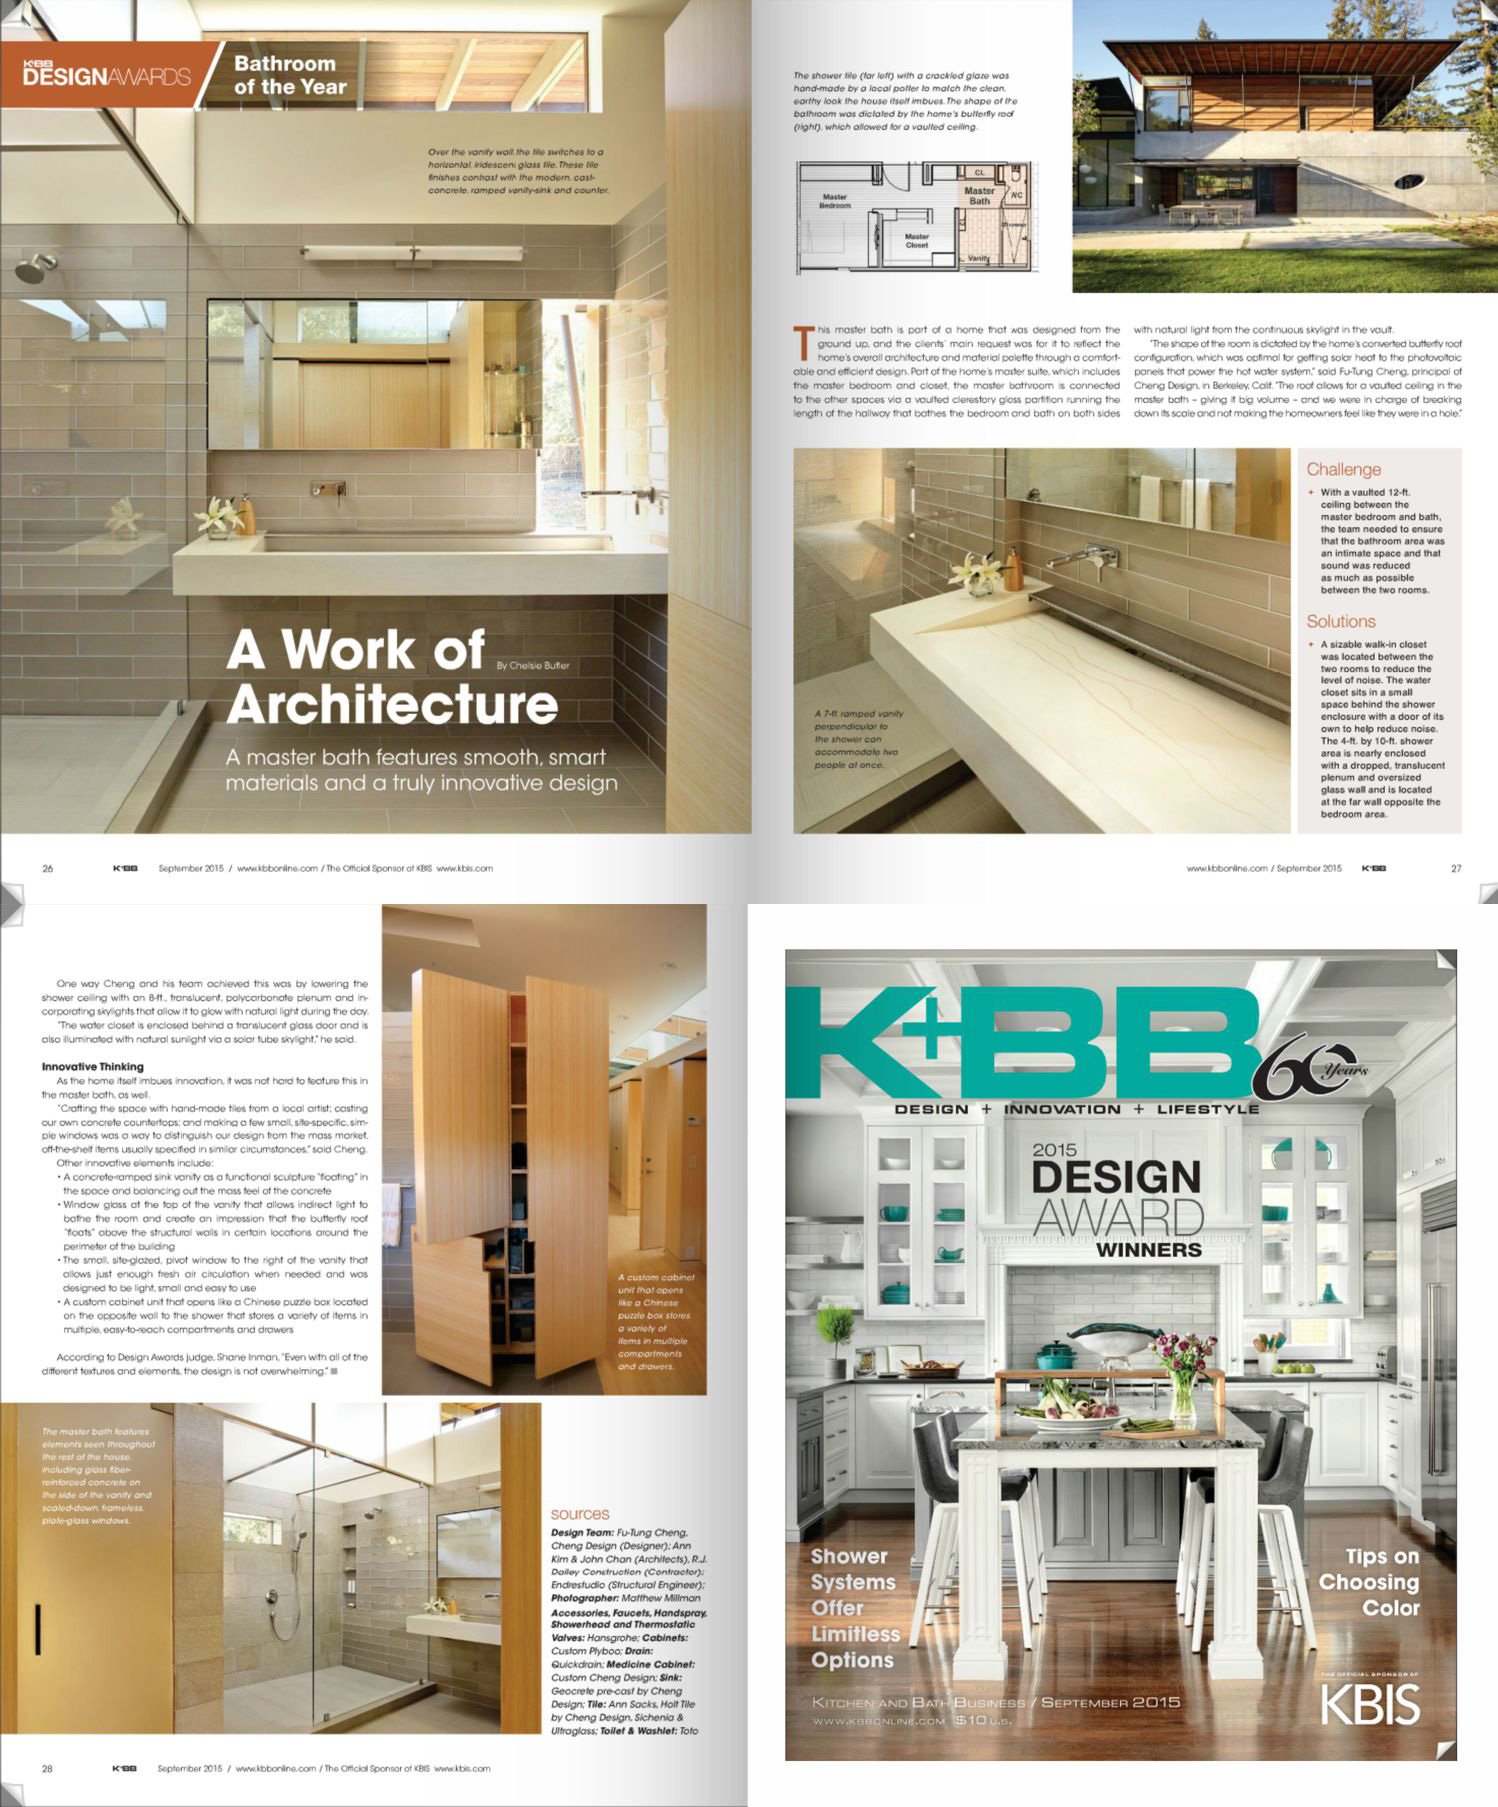 K+BB Design Awards: Bath of the Year